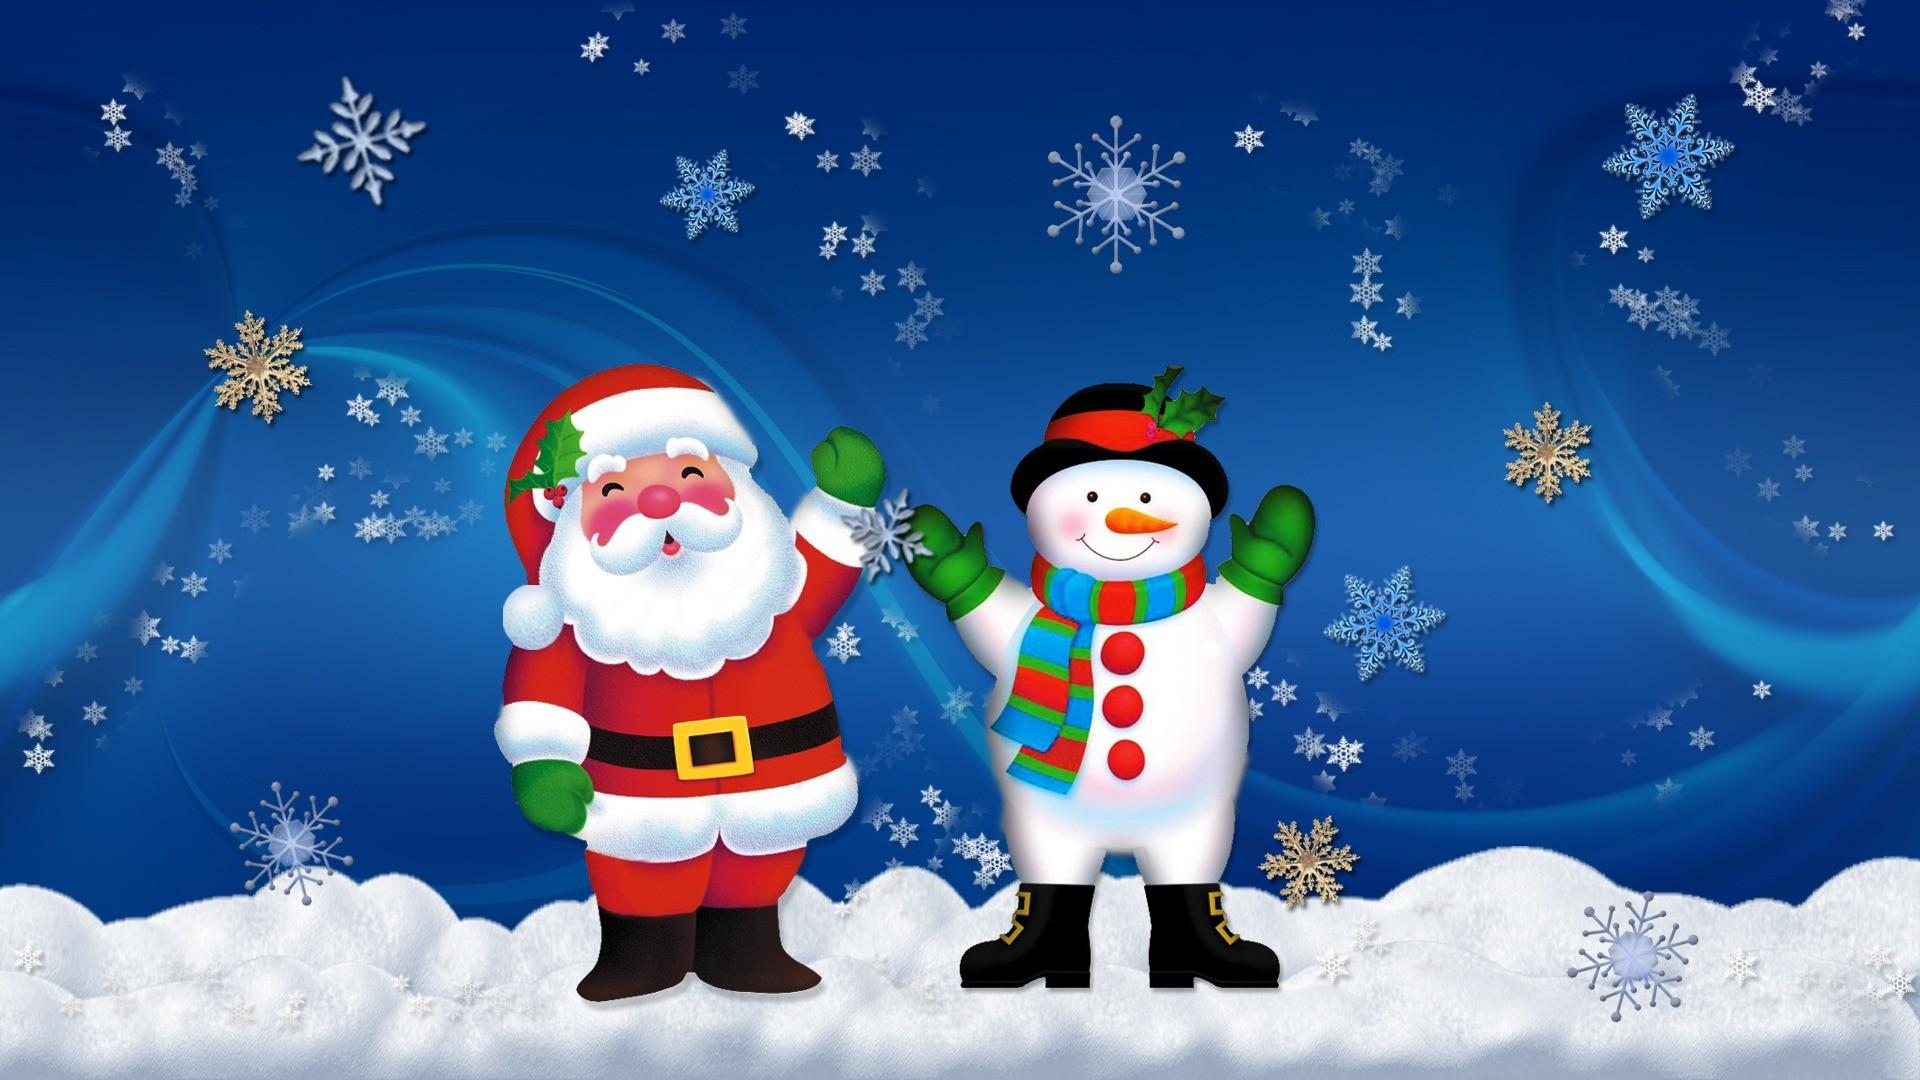 1920x1080 Santa And Snowman Wallpapers Stock Photos